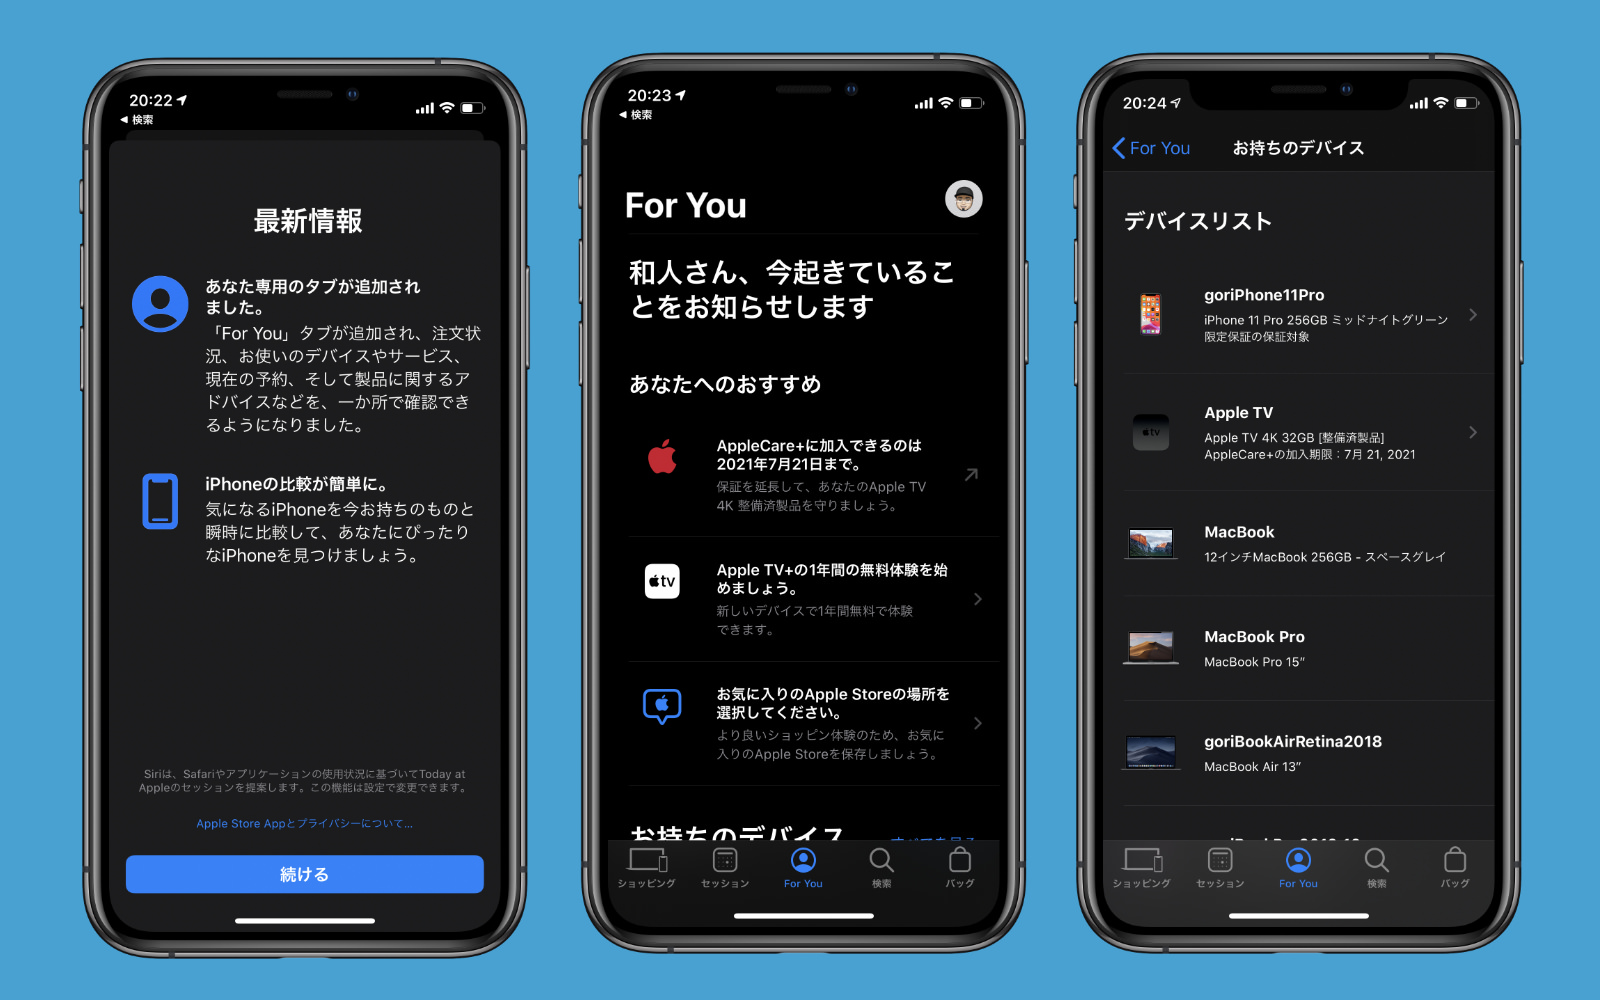 New Apple Store App